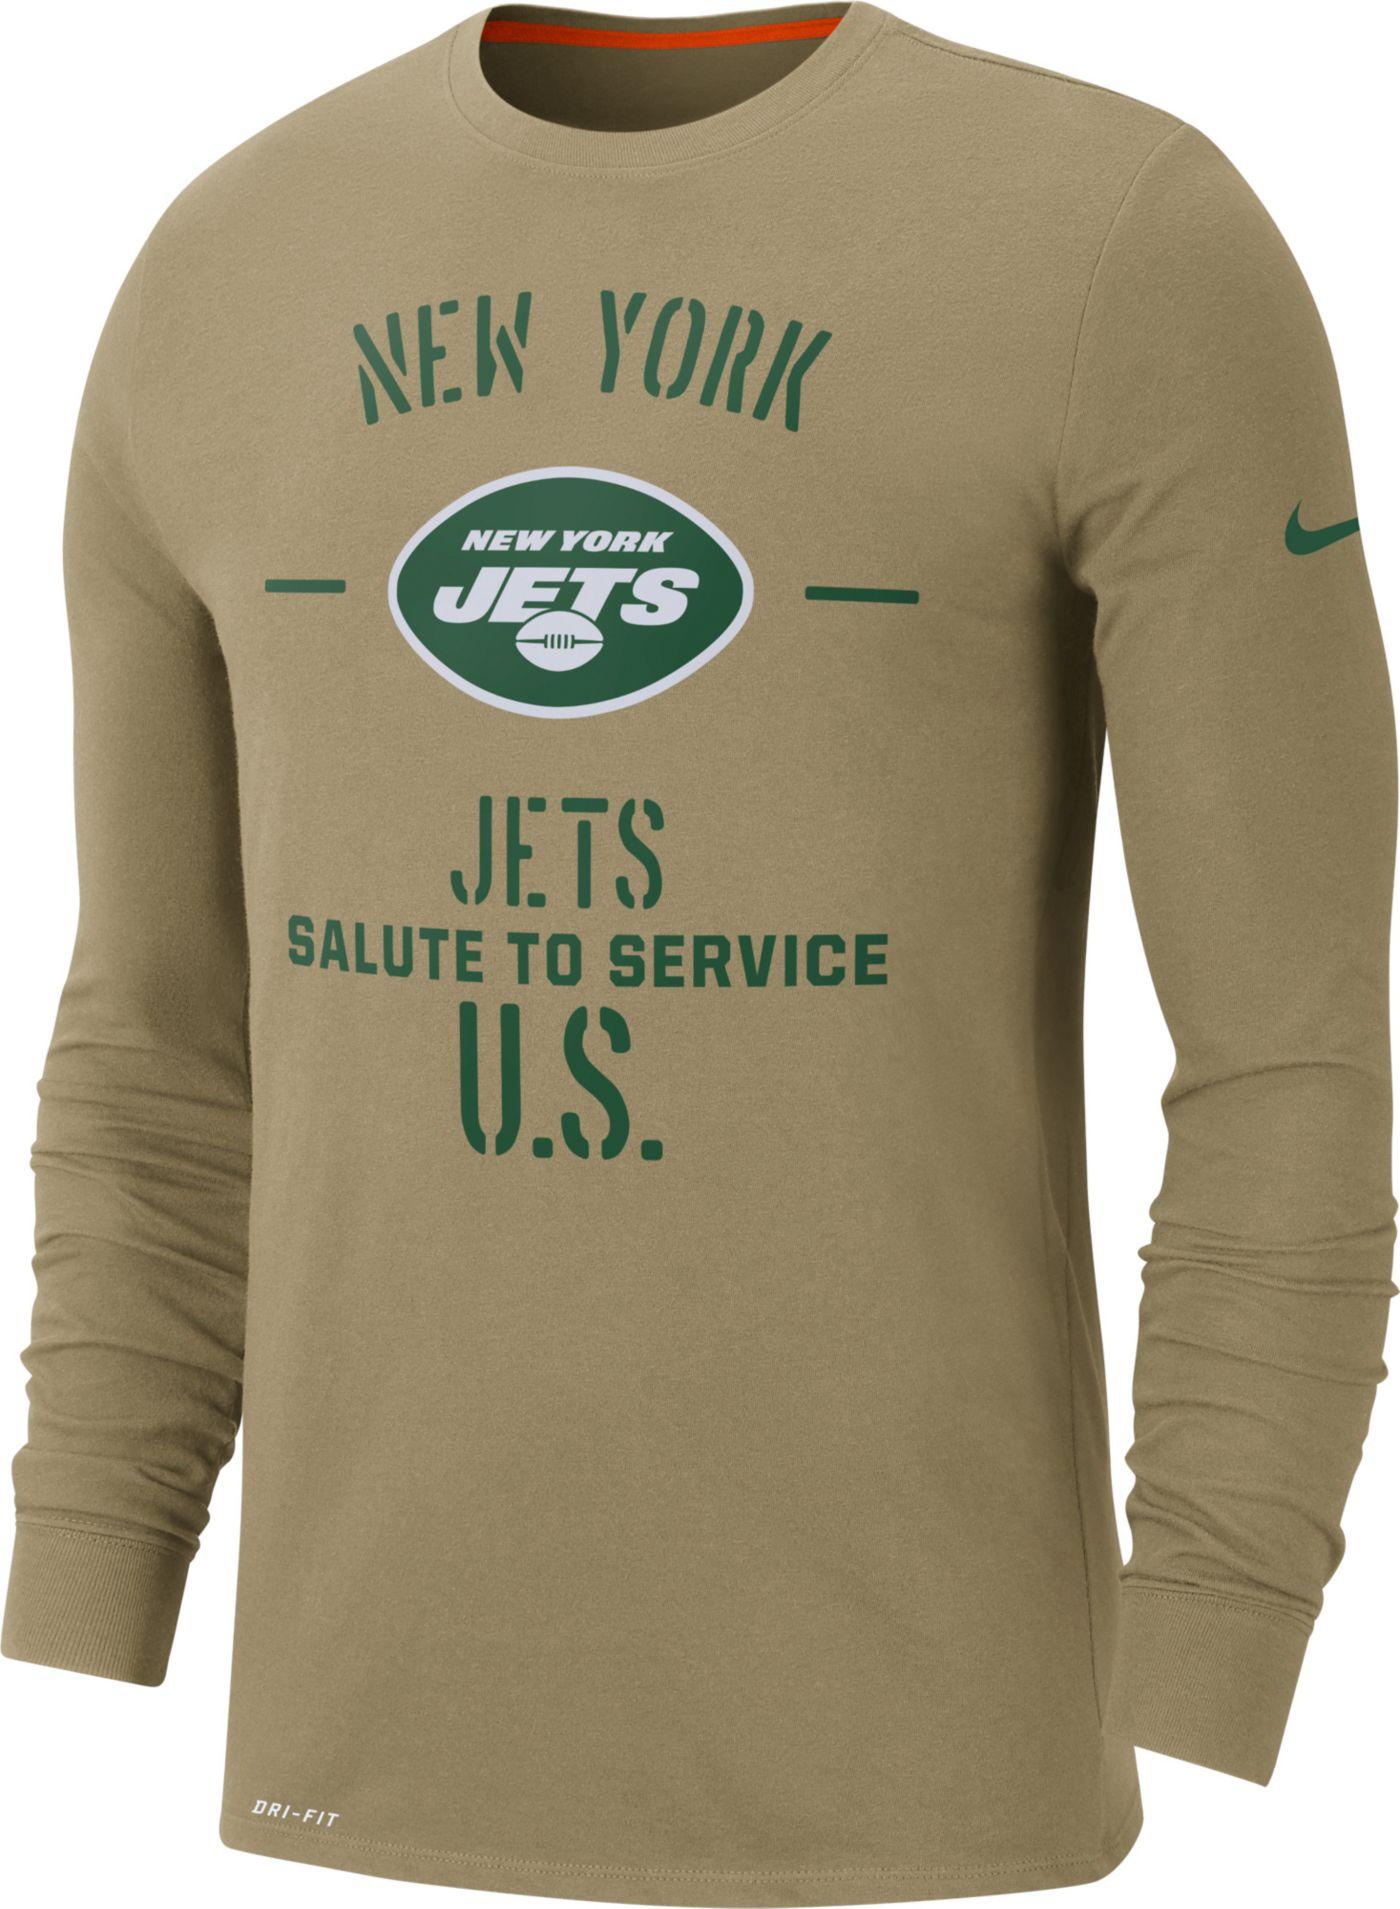 Nike Men's Salute to Service New York Jets Dri-FIT Beige Long Sleeve Shirt